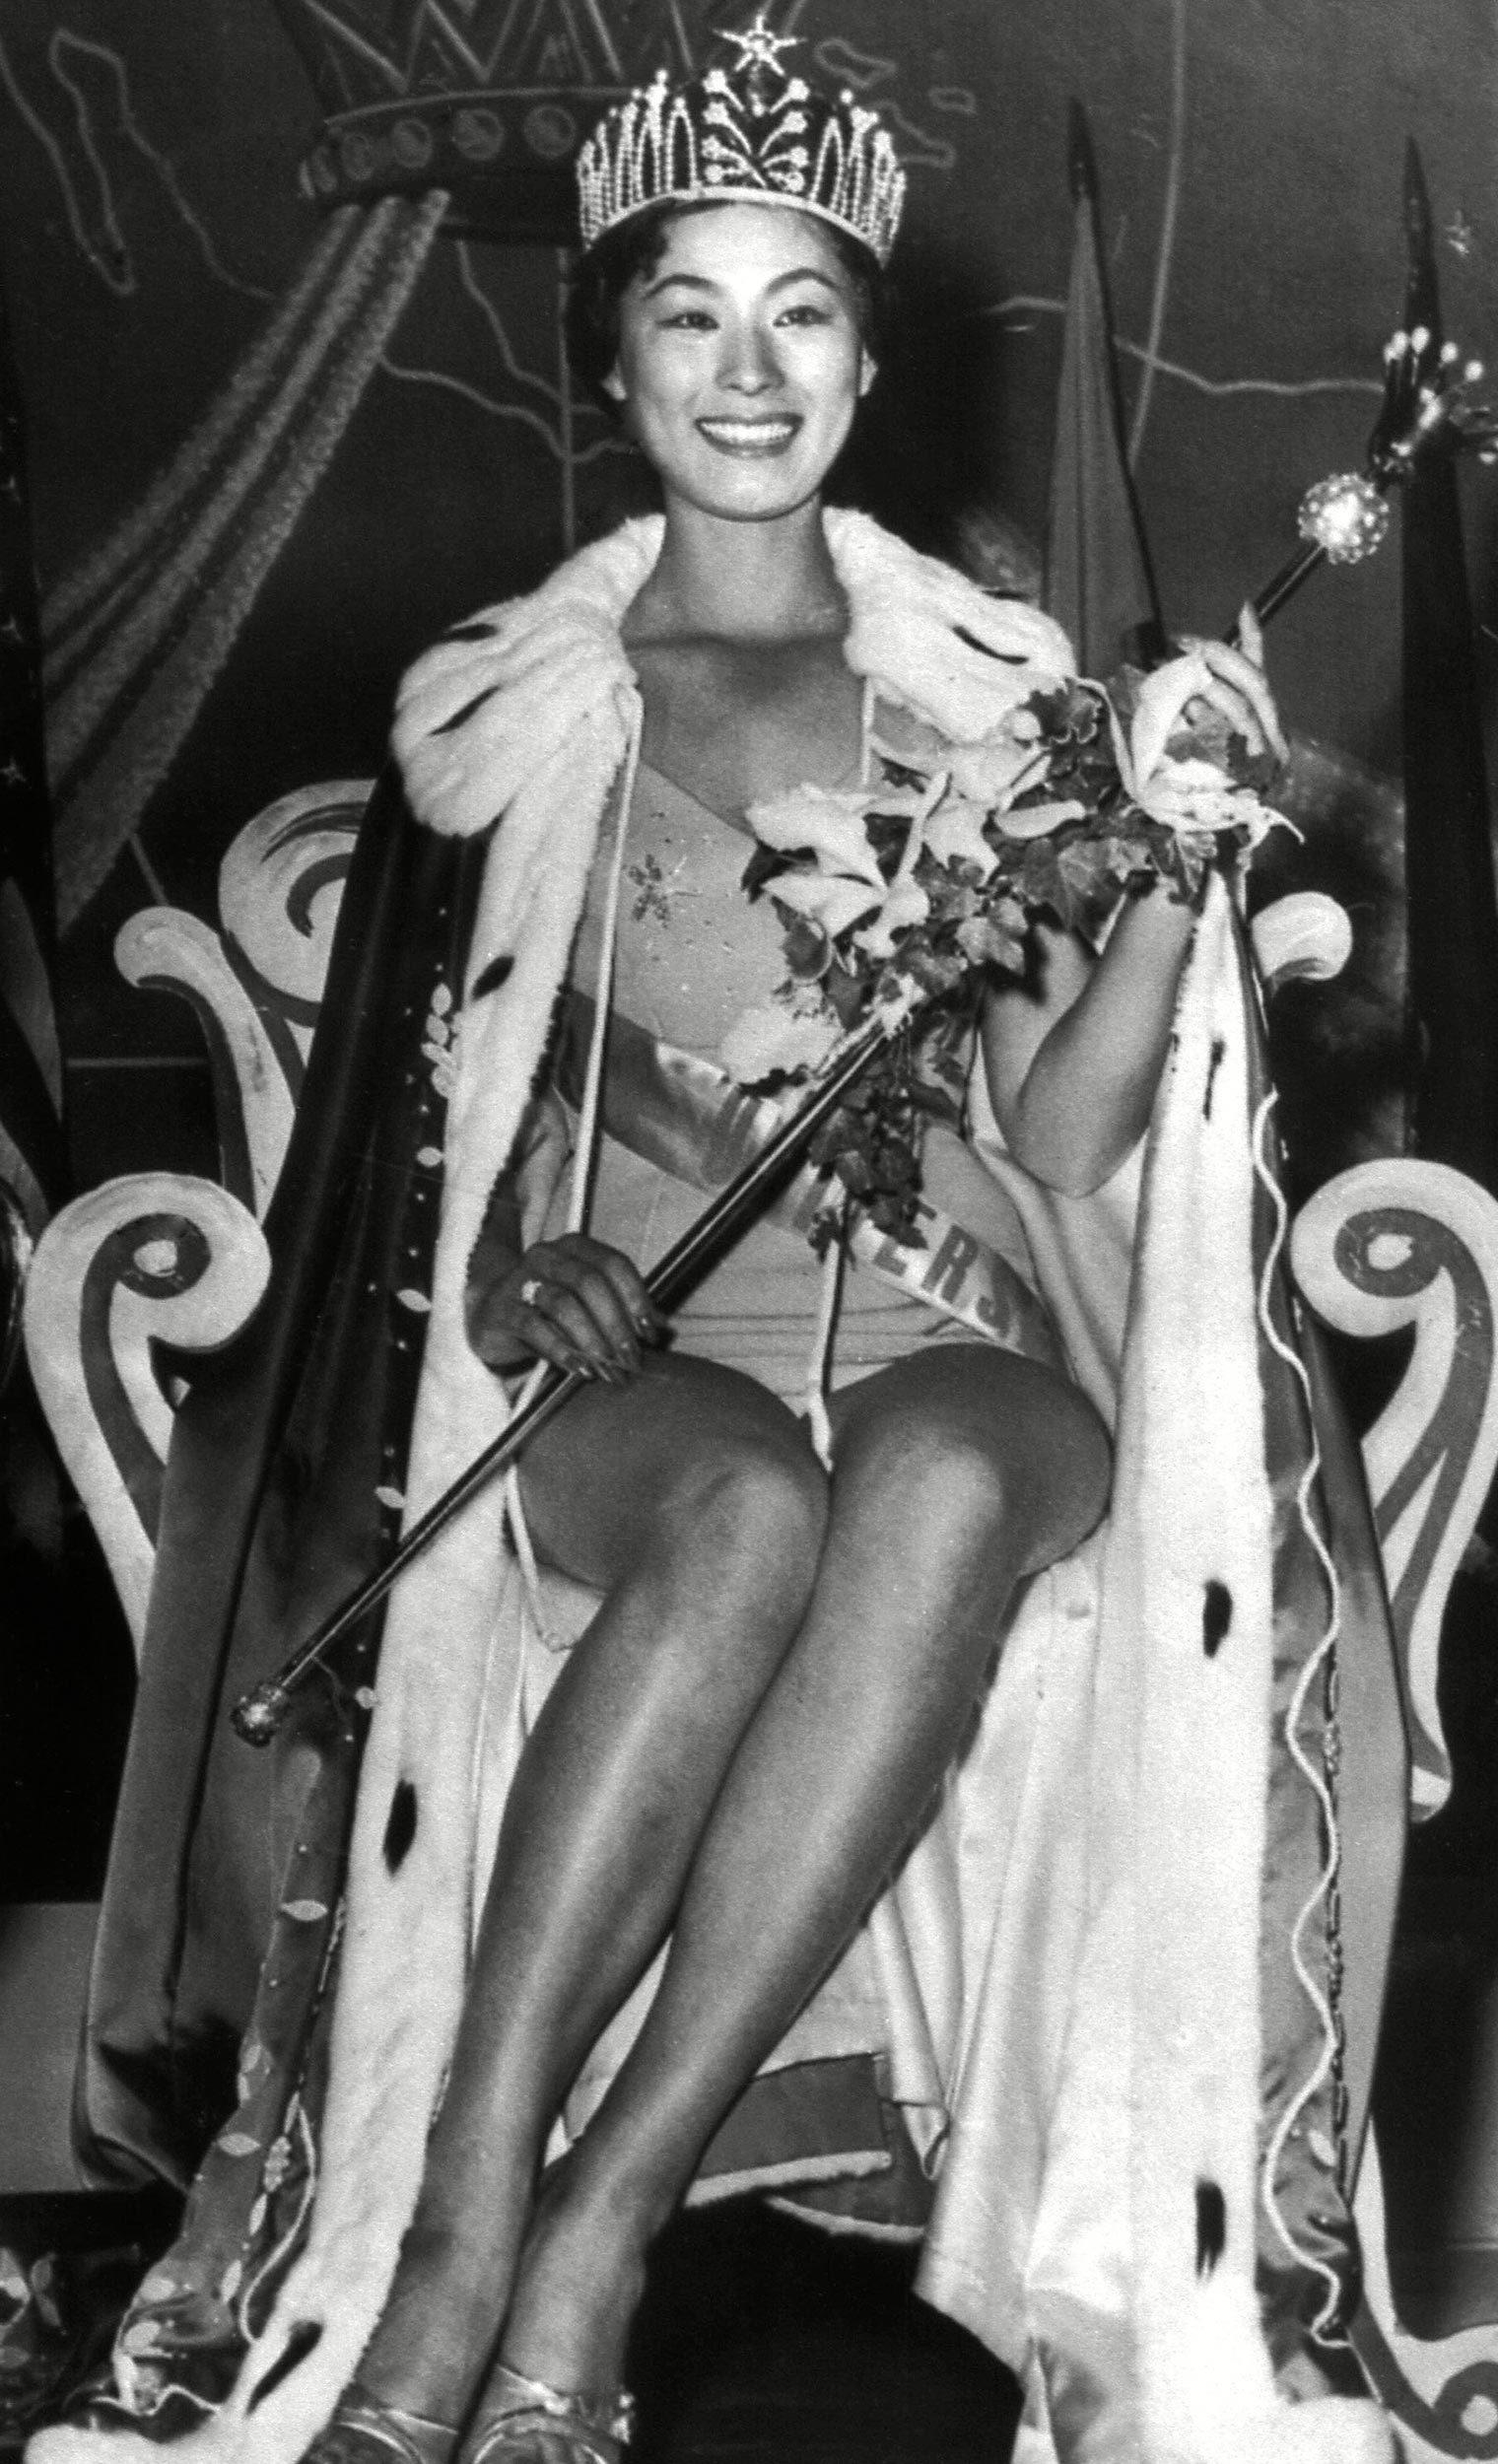 1959 Extravagant throne